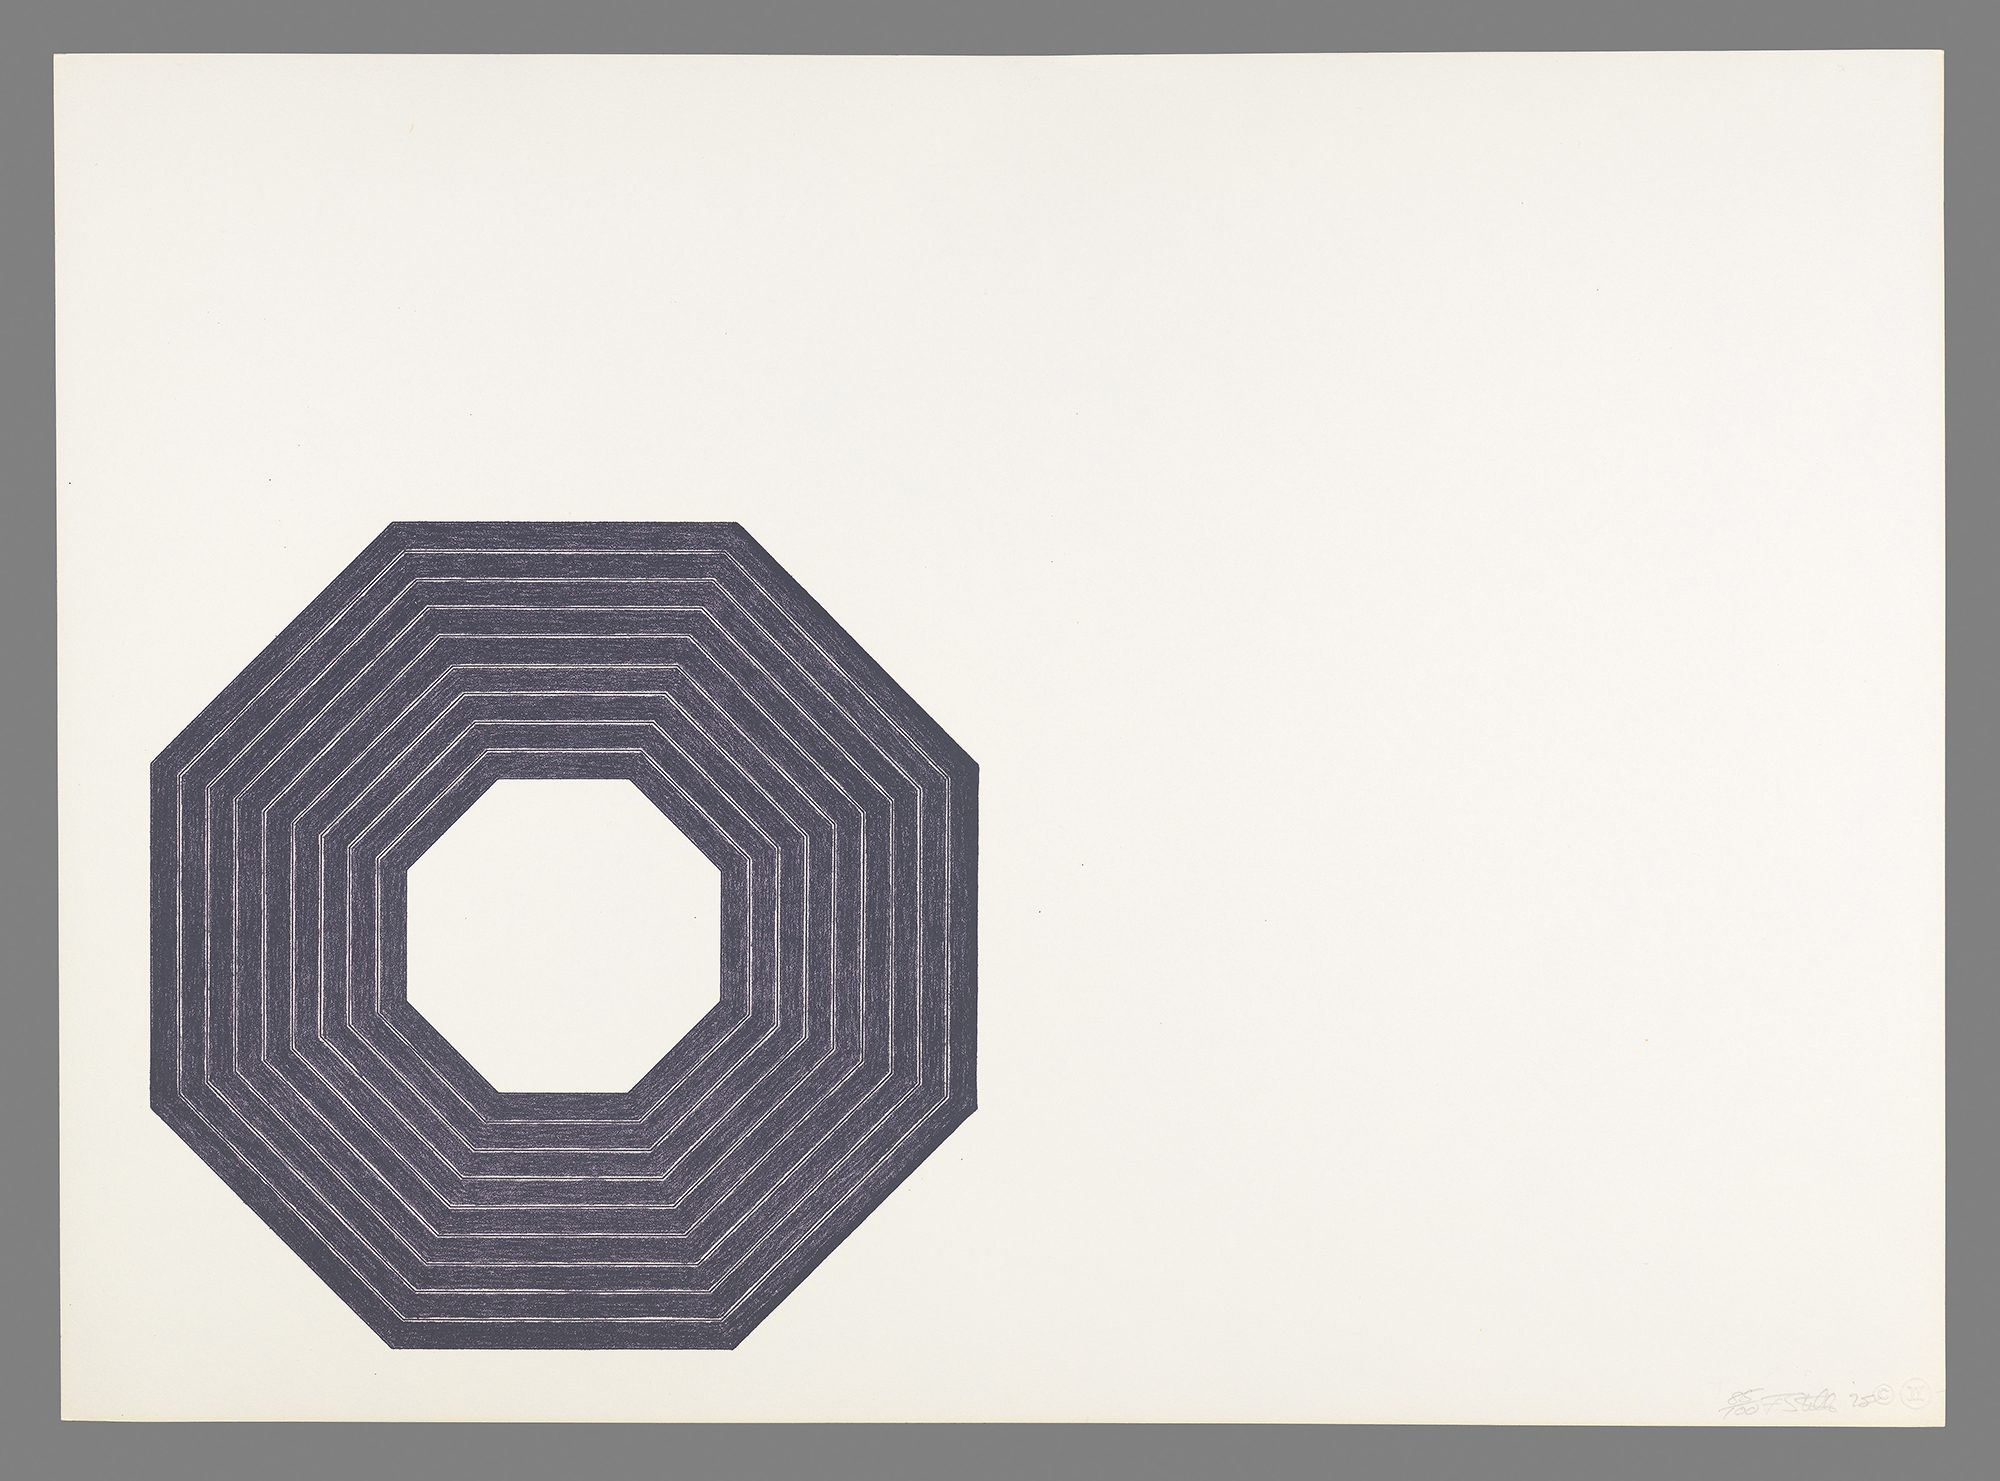 Frank Stella, Henry Garden (from